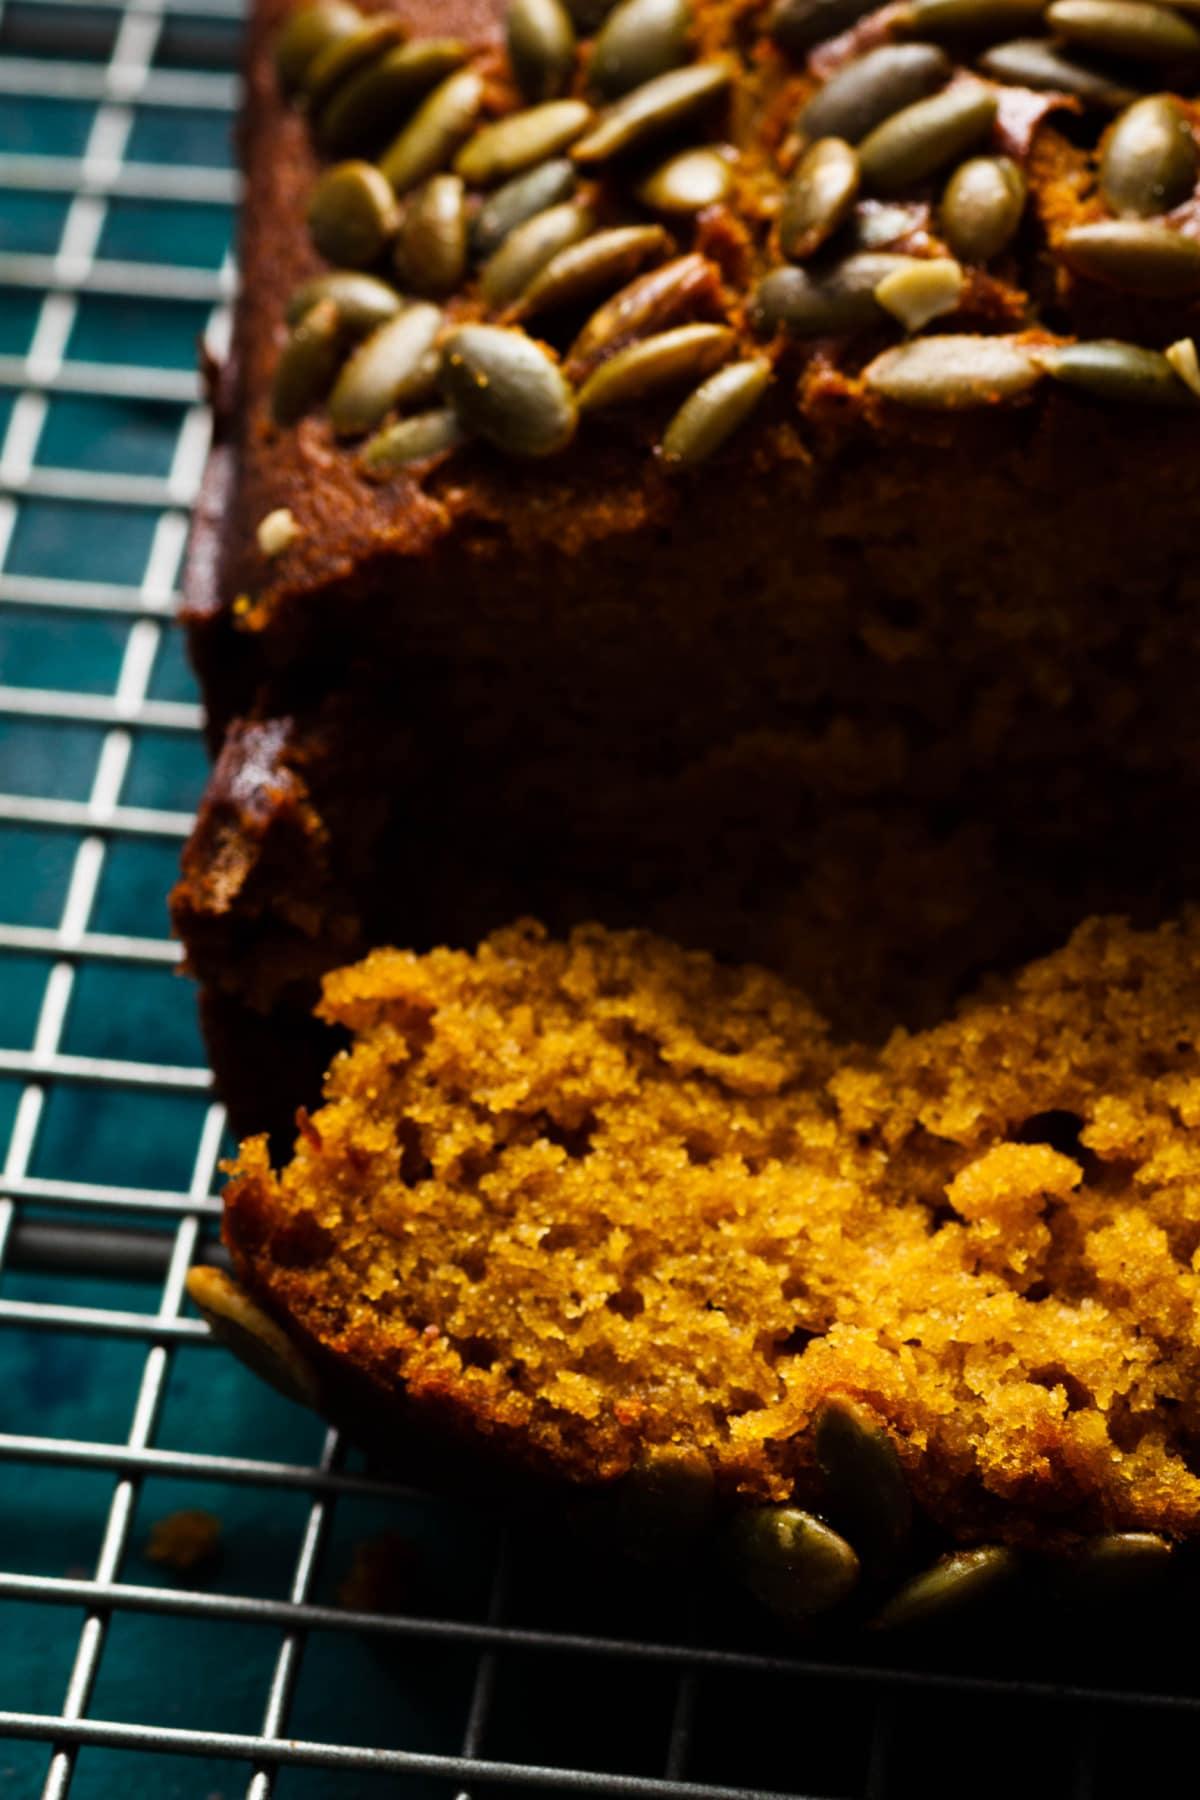 vegan pumpkin bread on cooling rack bread sliced